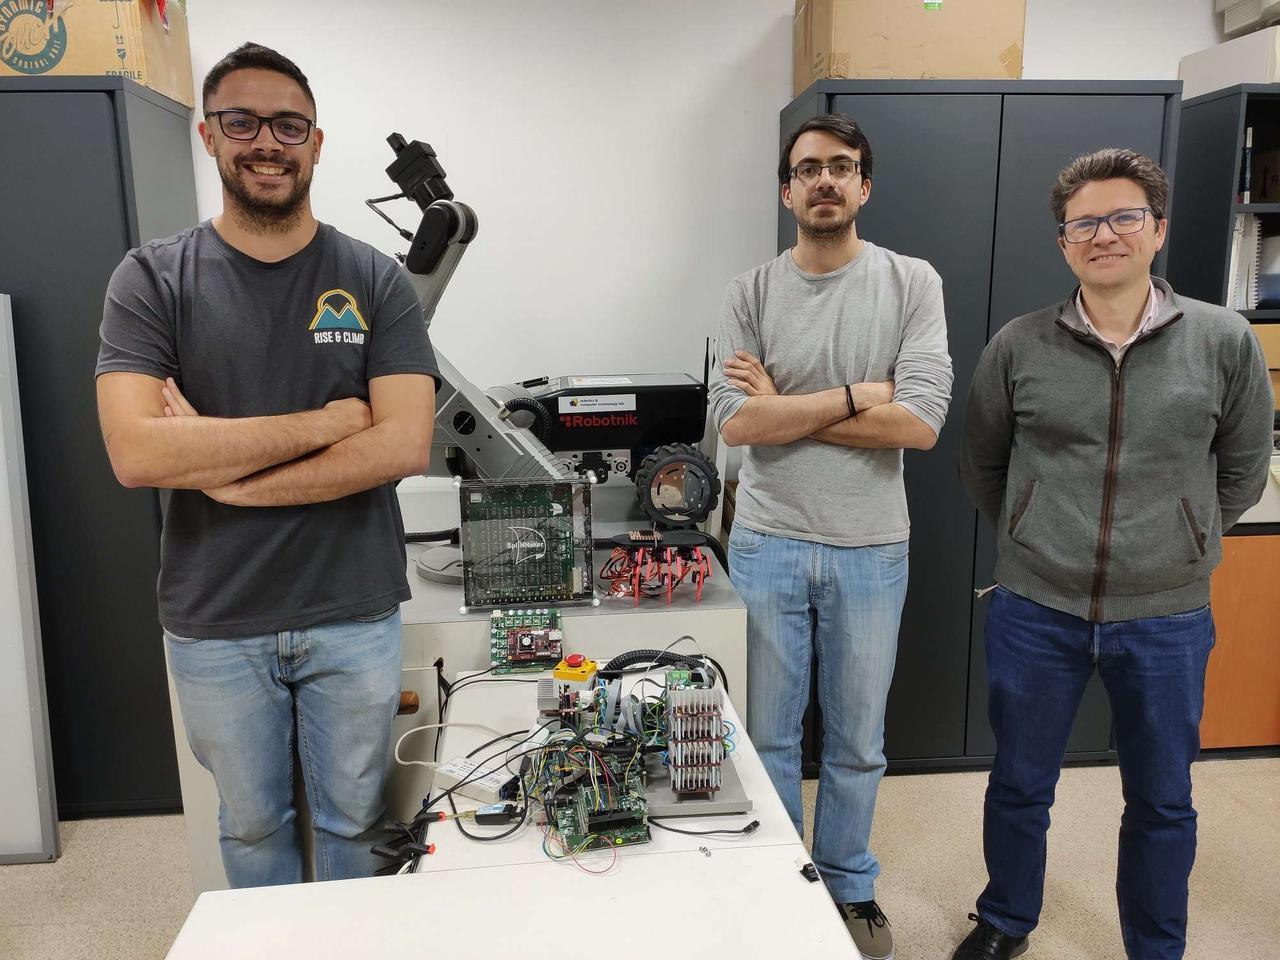 From right to left, team members Juan Pedro Domínguez, Alejandro Linares and Daniel Gutiérrez